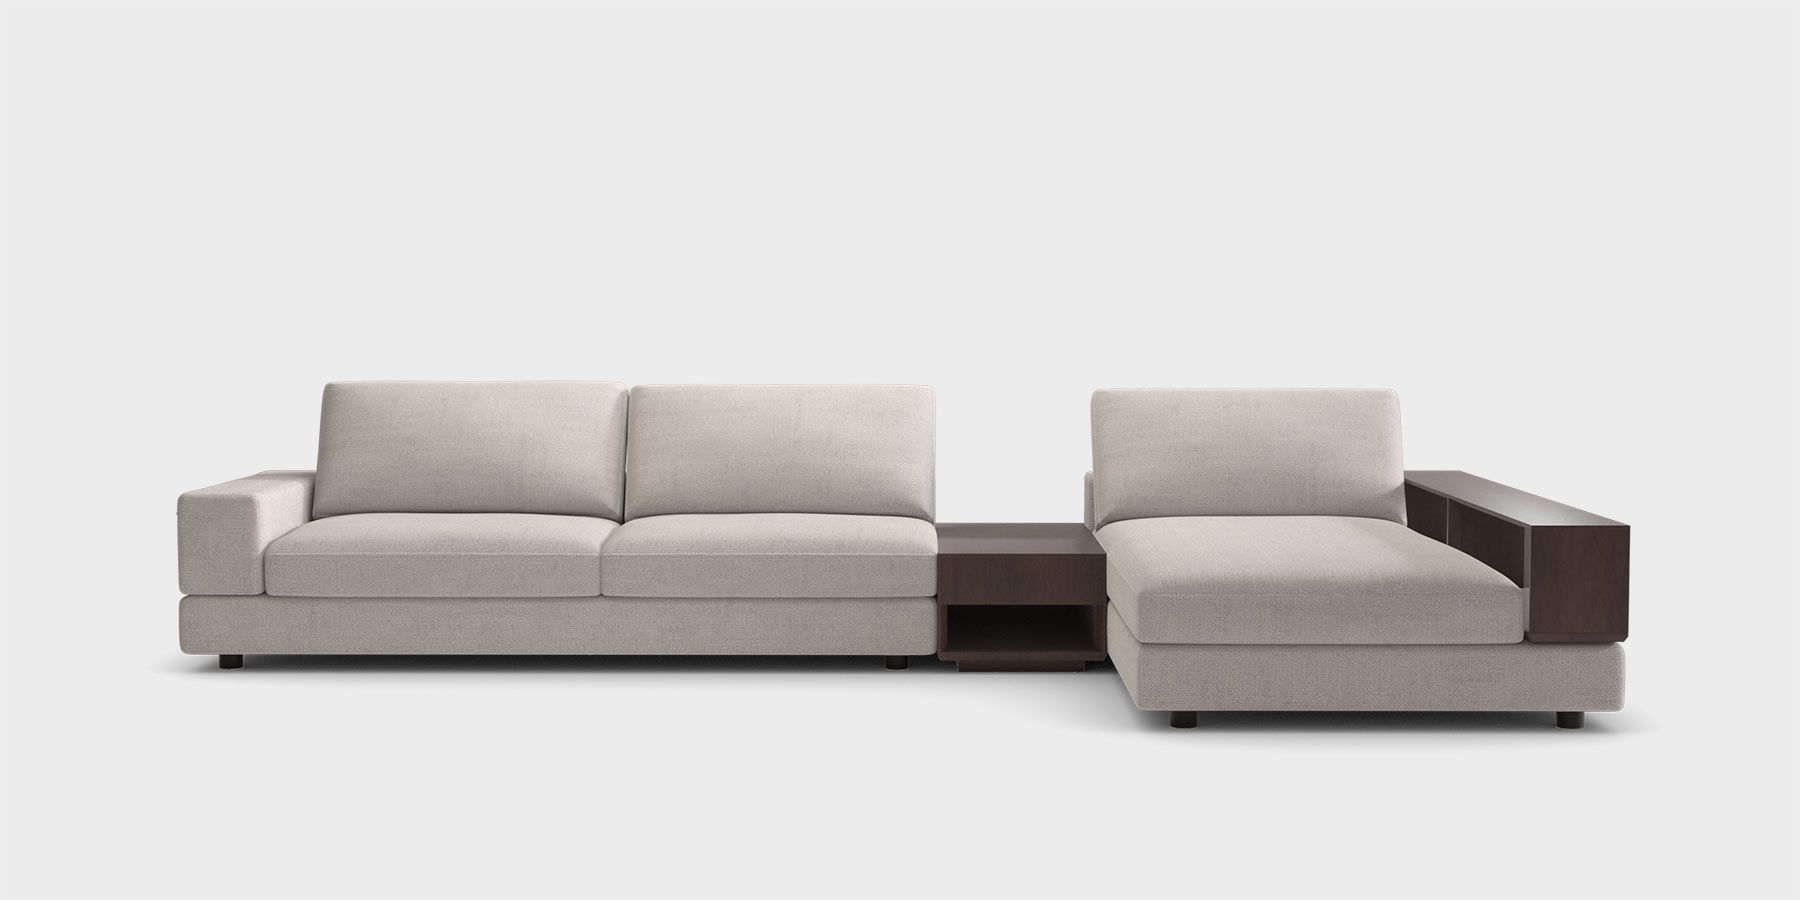 Jasper Modular Sofa Award Winning Design Modular Lounge Couch King Living Modular Sofa Modular Lounges Sofa